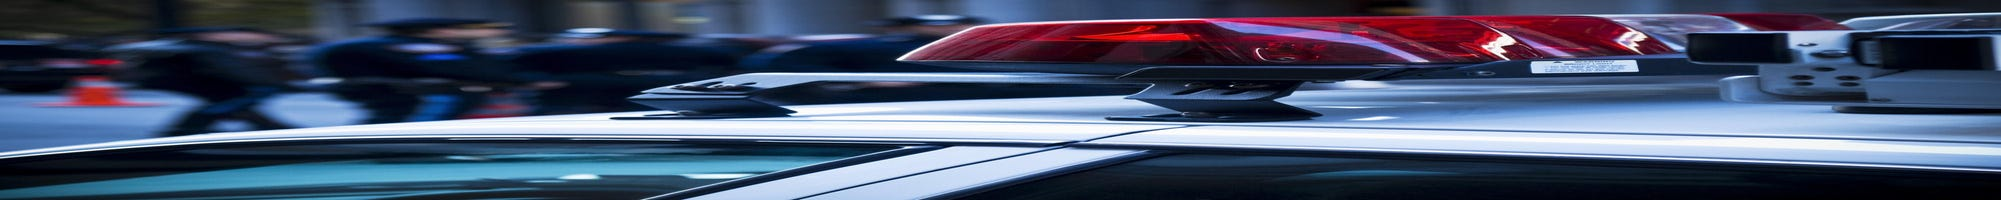 Police Blotter: Stolen truck in Hanover; DWI in Washington Twp.